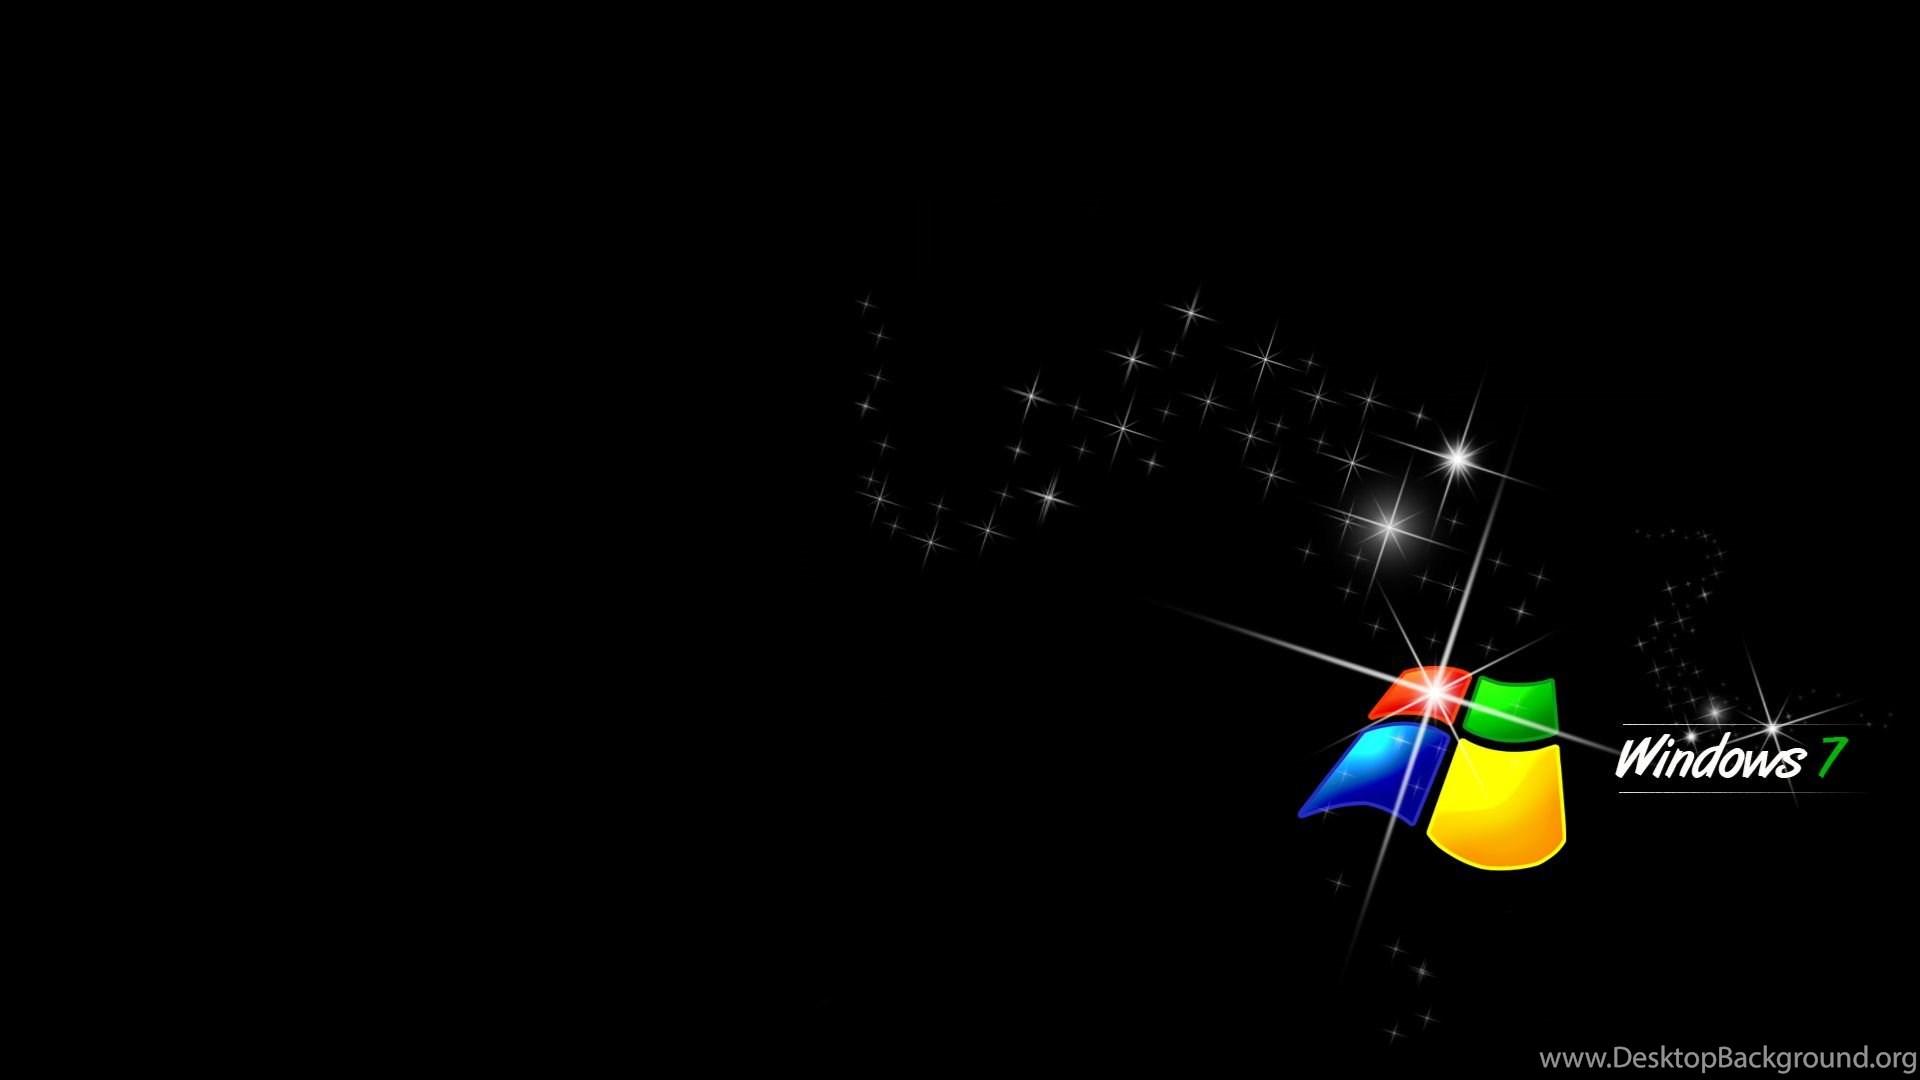 Windows 7 Hd Wallpapers 1920x1080 193568 Desktop Background